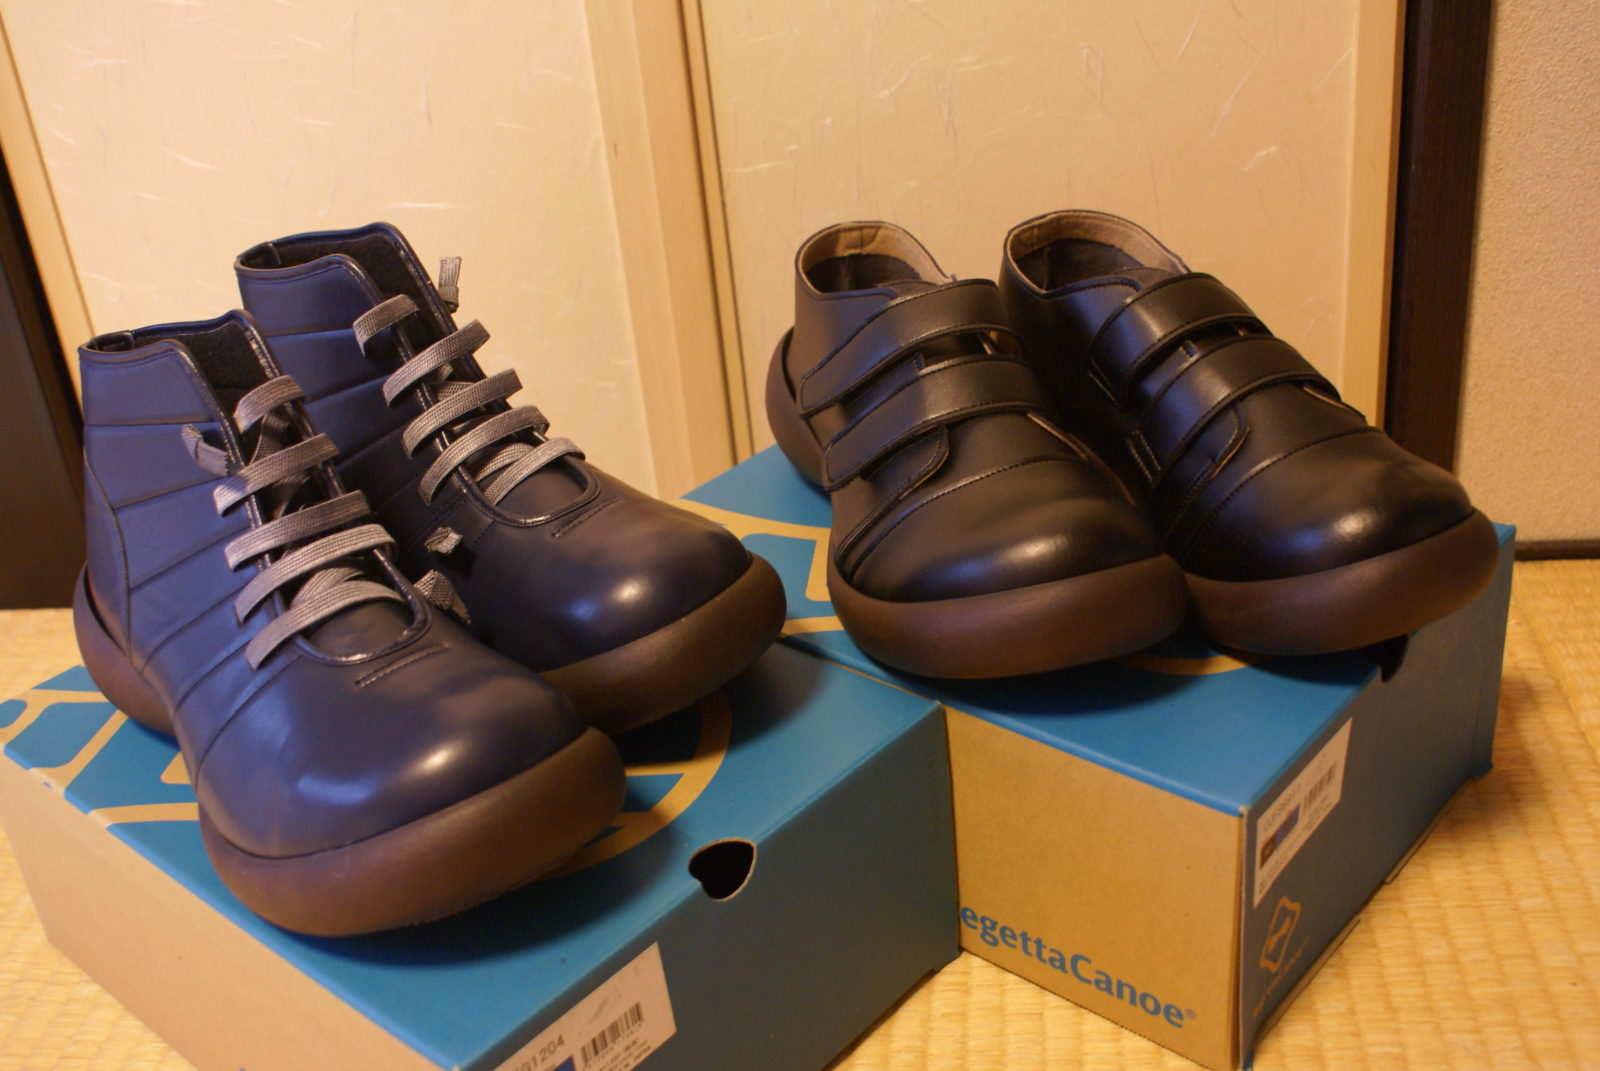 54314ead91134 夫婦で買い!大阪ブランド「リゲッタカヌー」靴の福袋。事前予約も ...